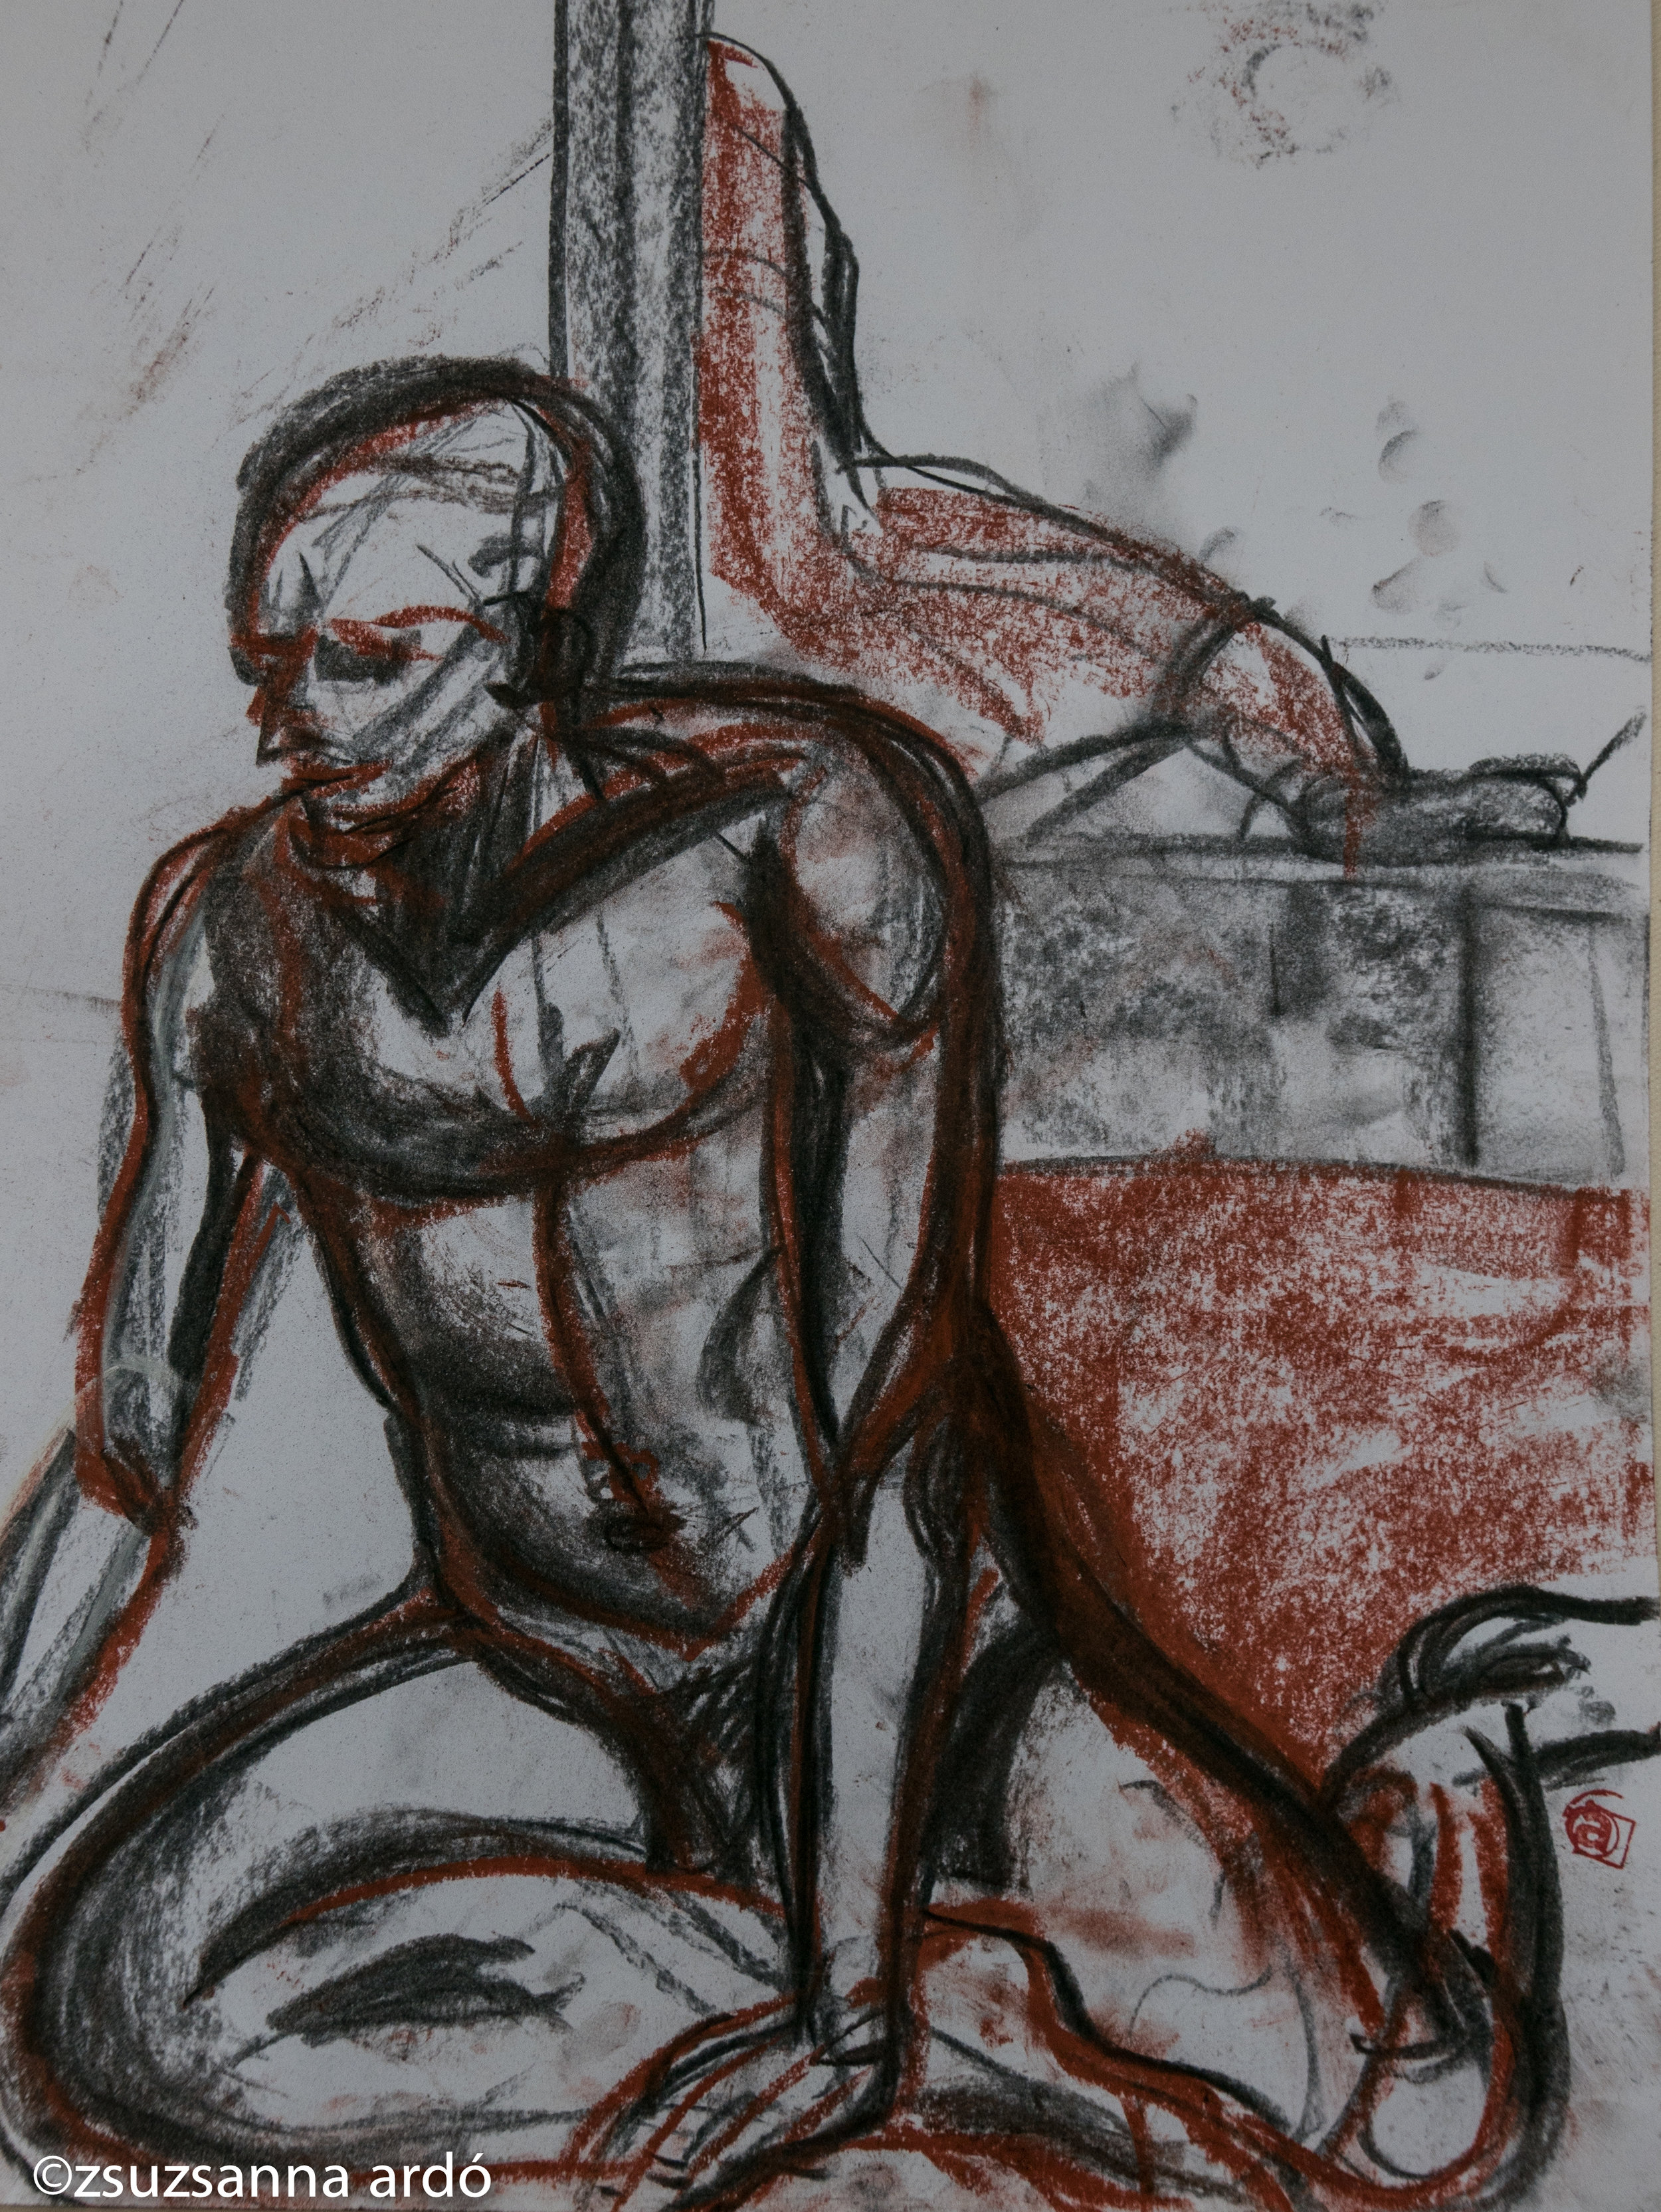 17 UK lon RA nudes 5Spt©Zsuzsanna Ardó-1.jpg